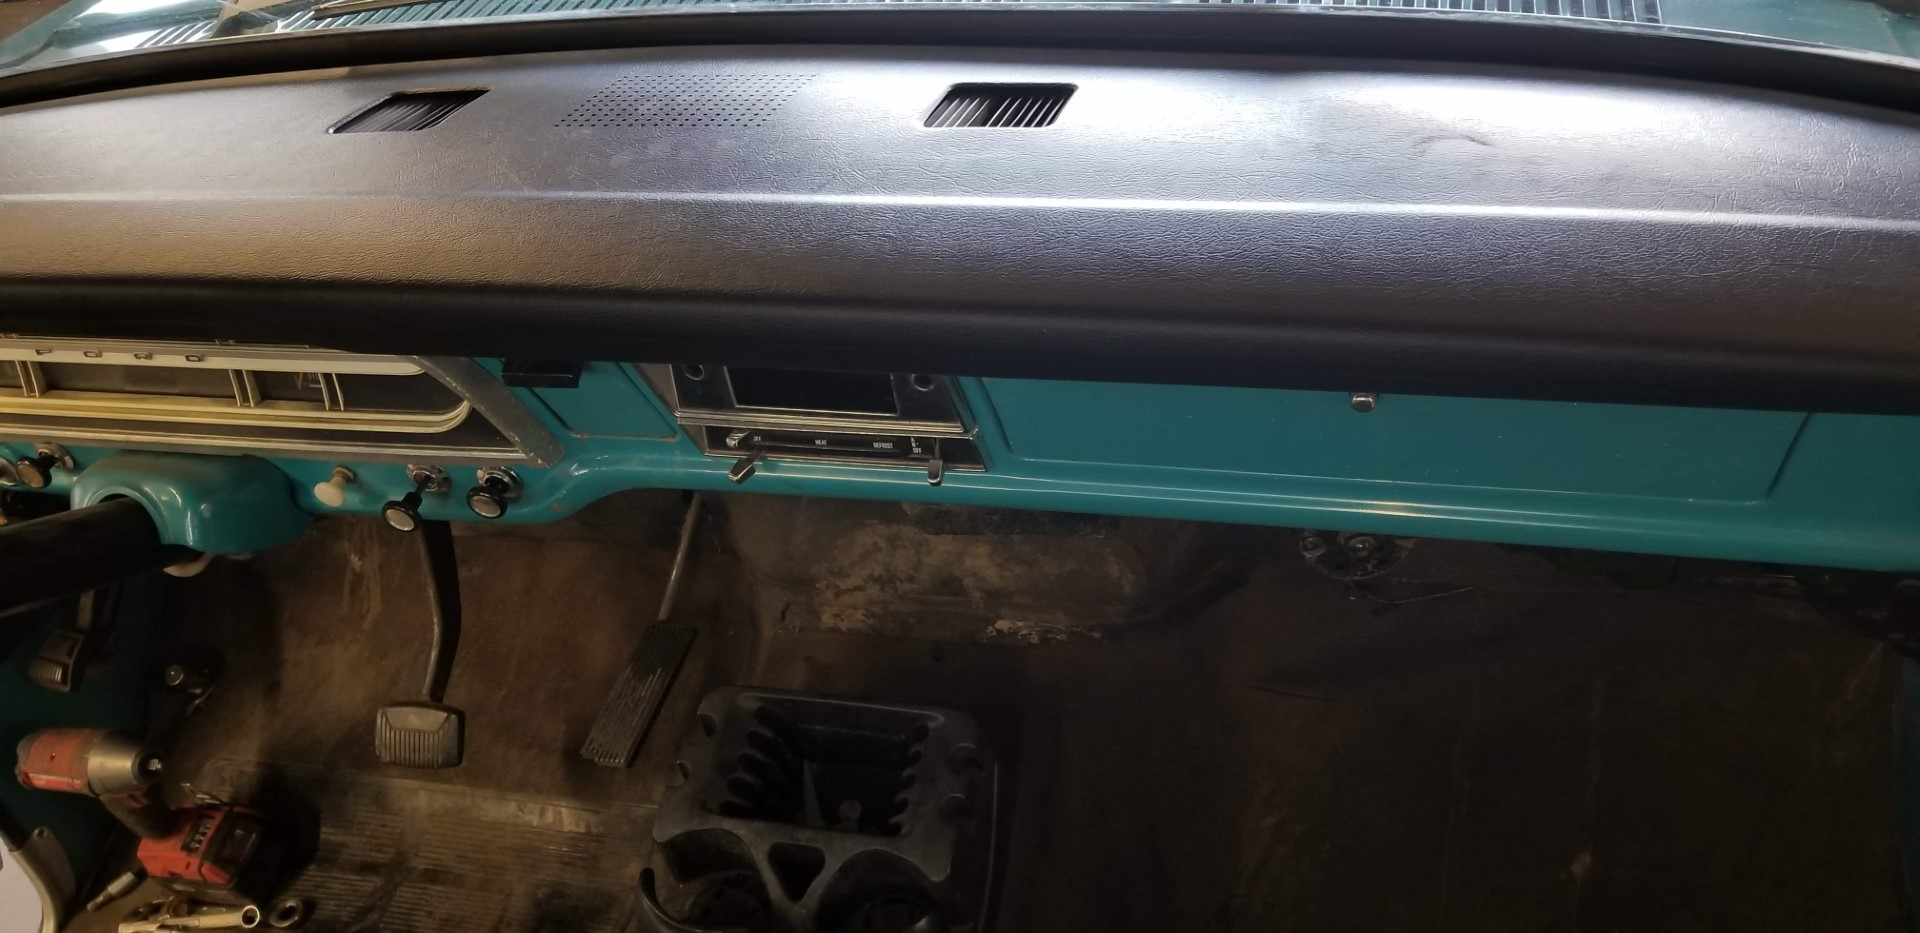 1969-Ford-F250-Custom-Cab-Camper-Special-360ci-V8-2